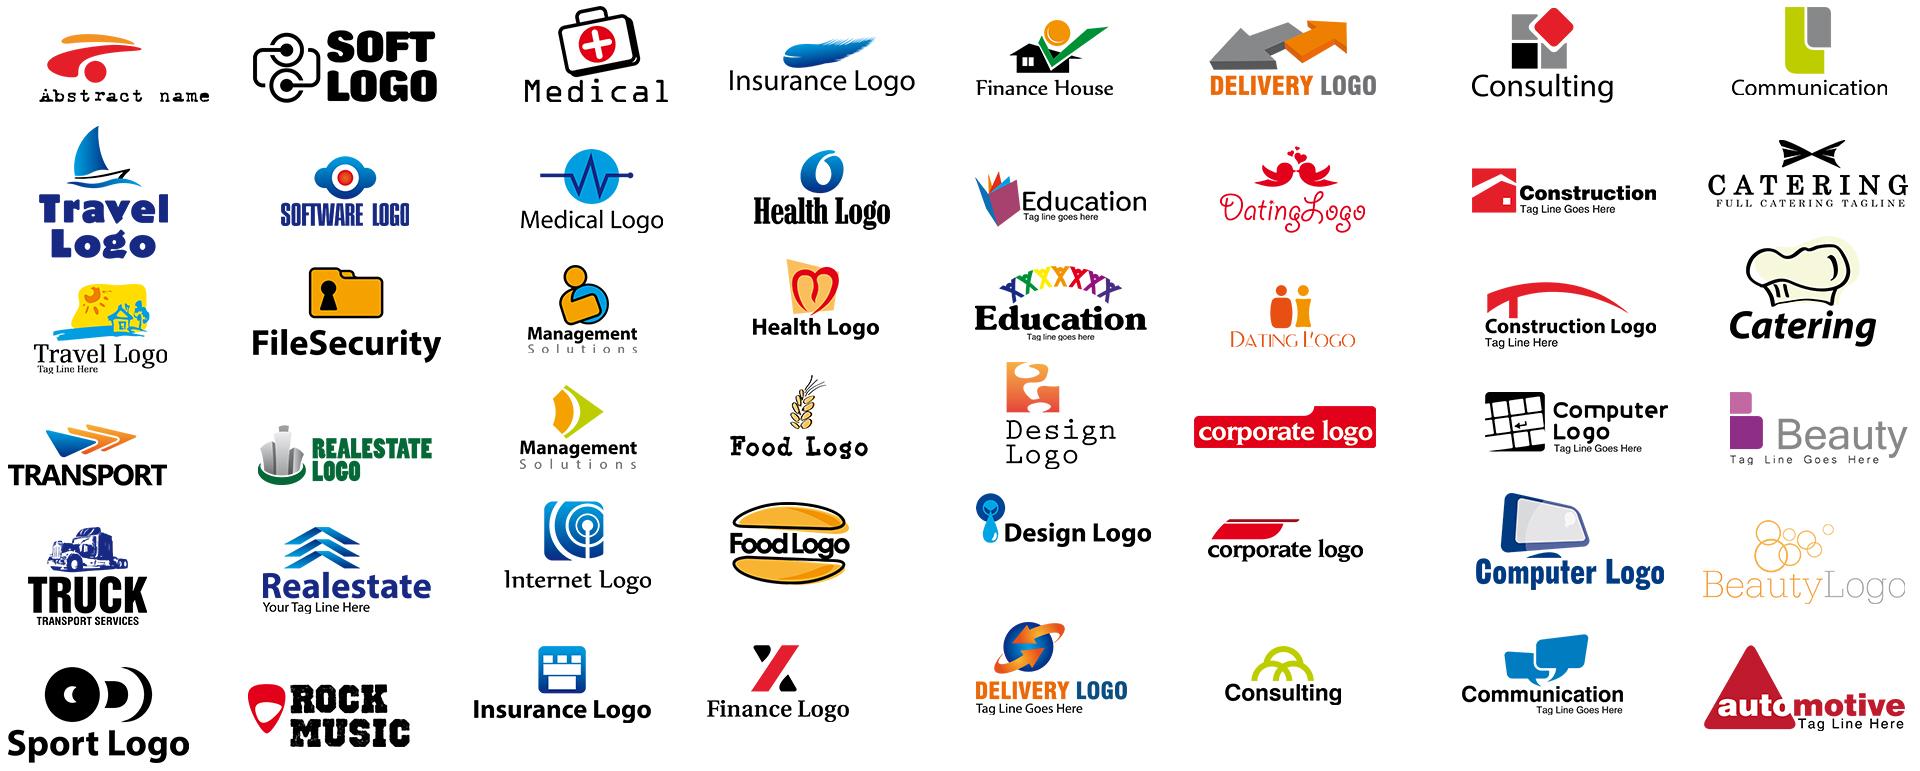 Logo Design Samples Psd Free Download